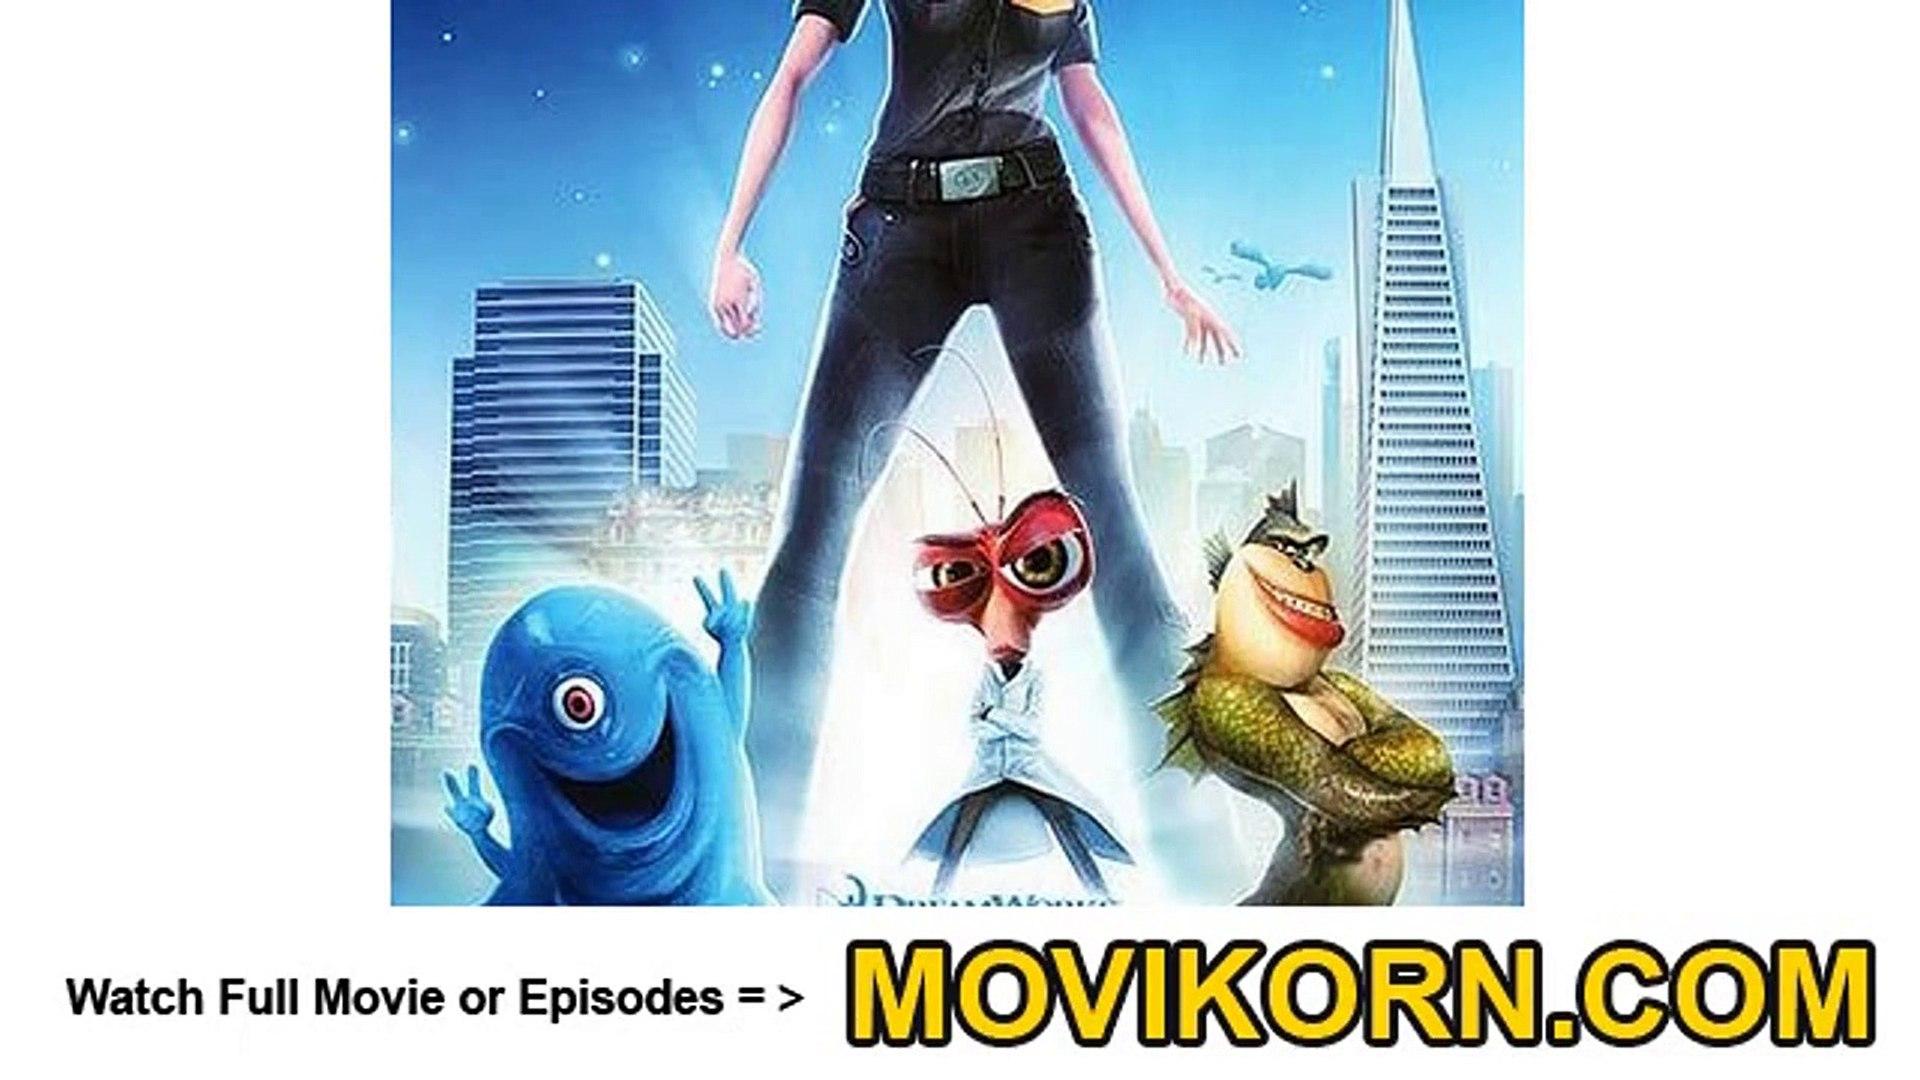 [HD] Monsters vs Aliens 2009 Stream Online